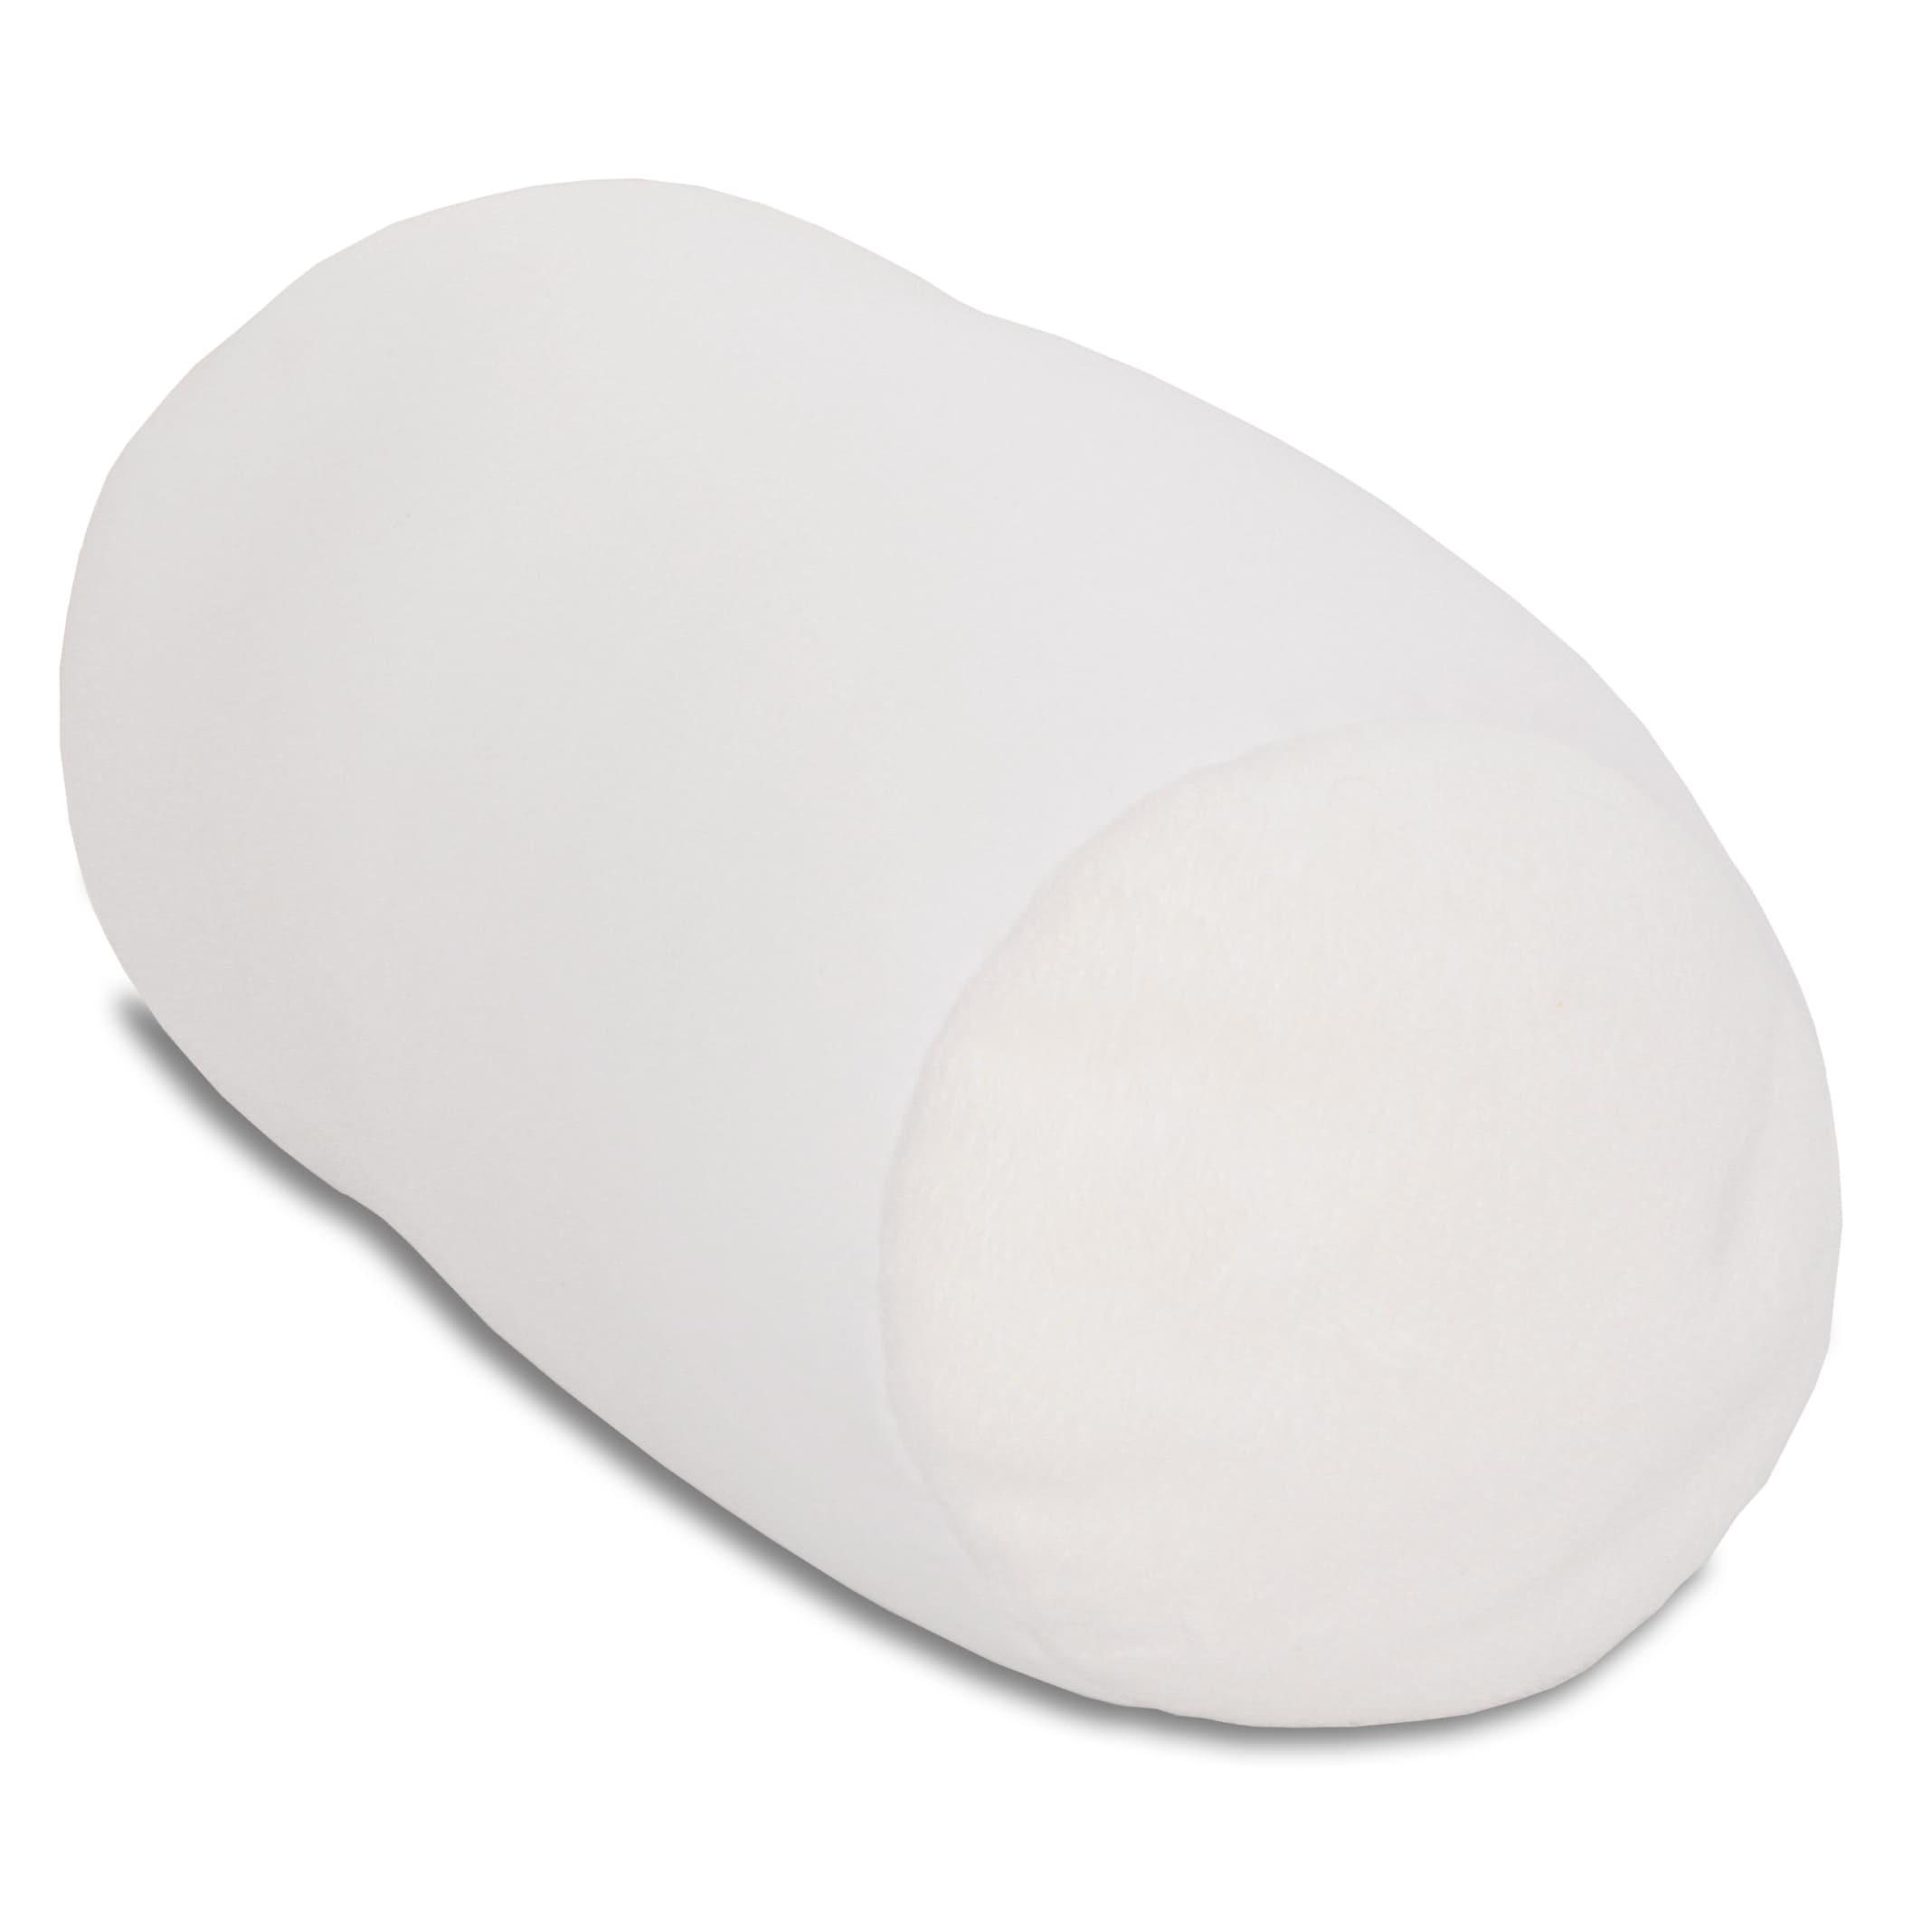 Deluxe Comfort Mini Squishy Mooshi Microbead Pillow Neck ...